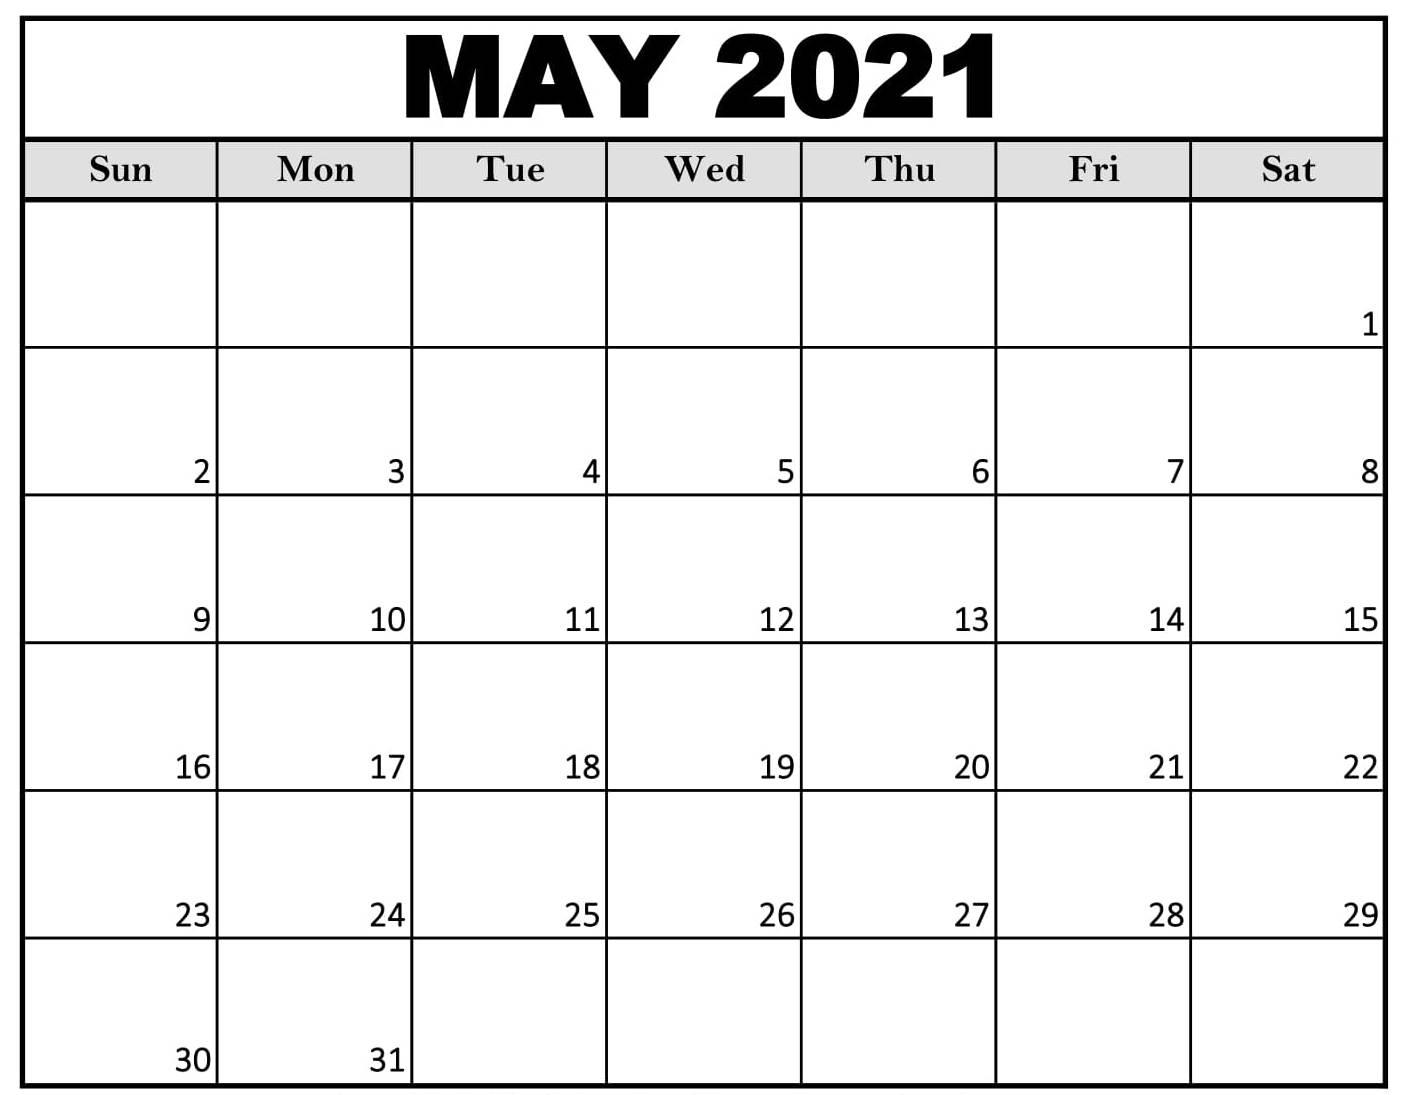 Blank May 2021 Calendar Download